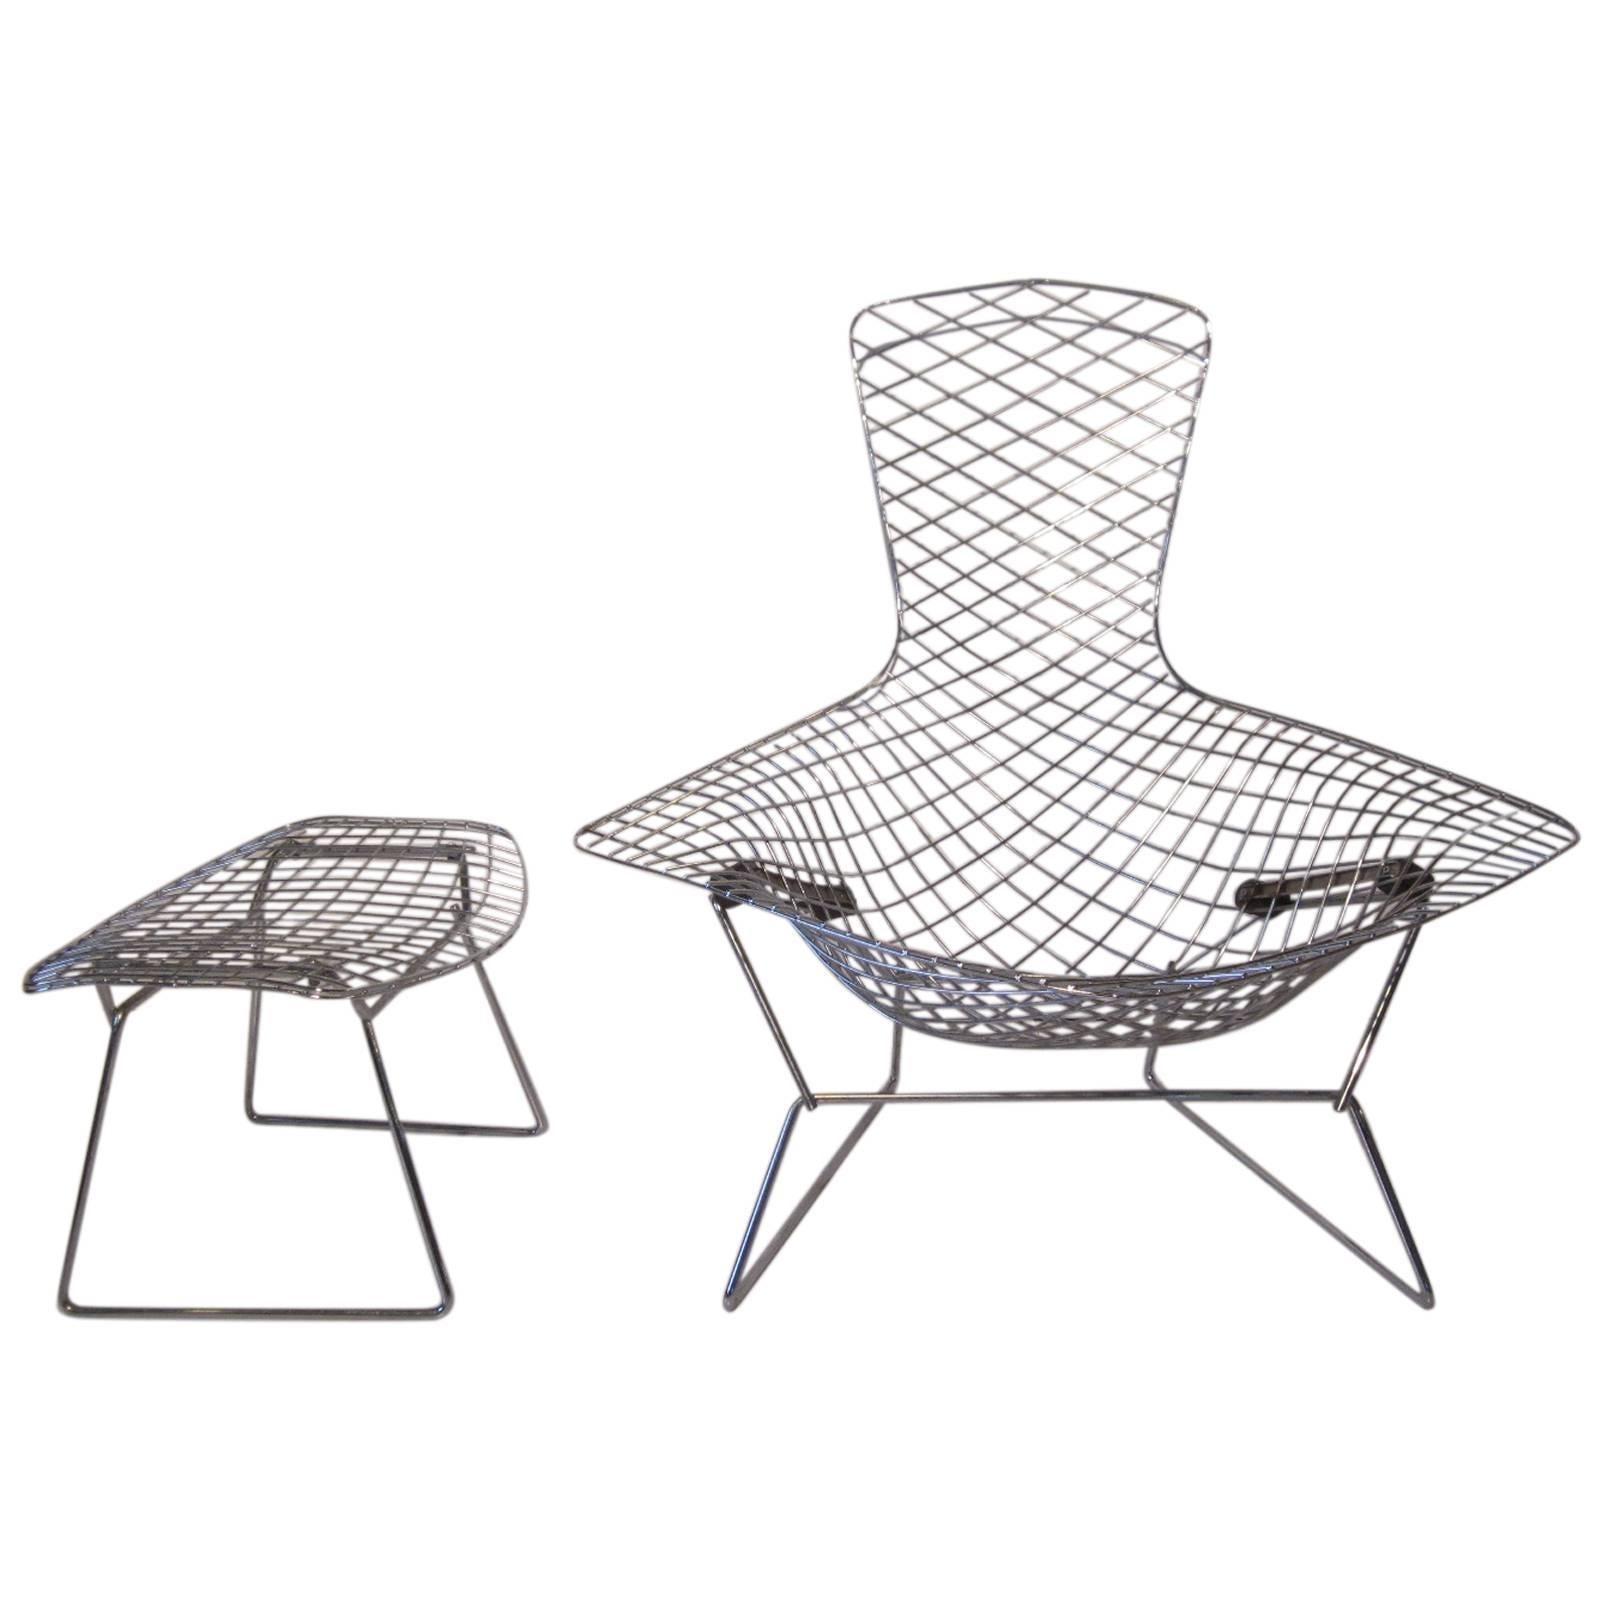 harry bertoia chrome bird chair with ottoman for knoll at 1stdibs